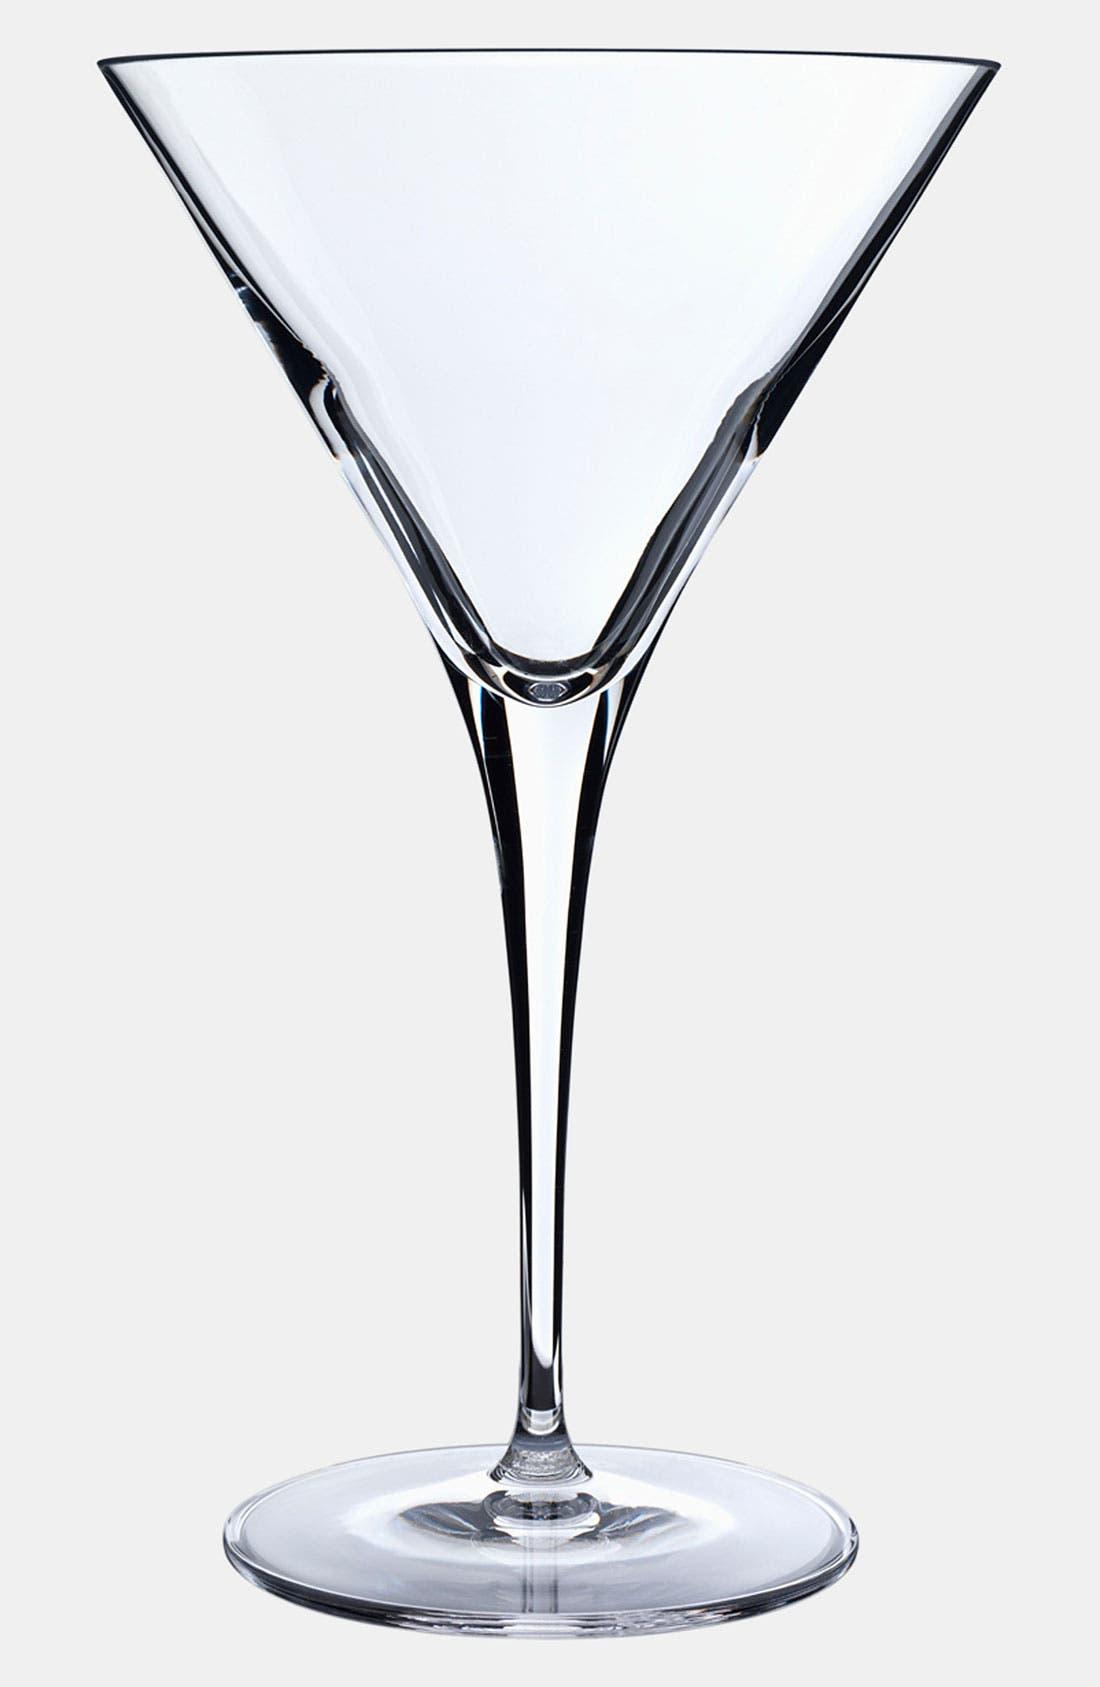 Luigi Bormioli Martini Glasses (Set of 4)